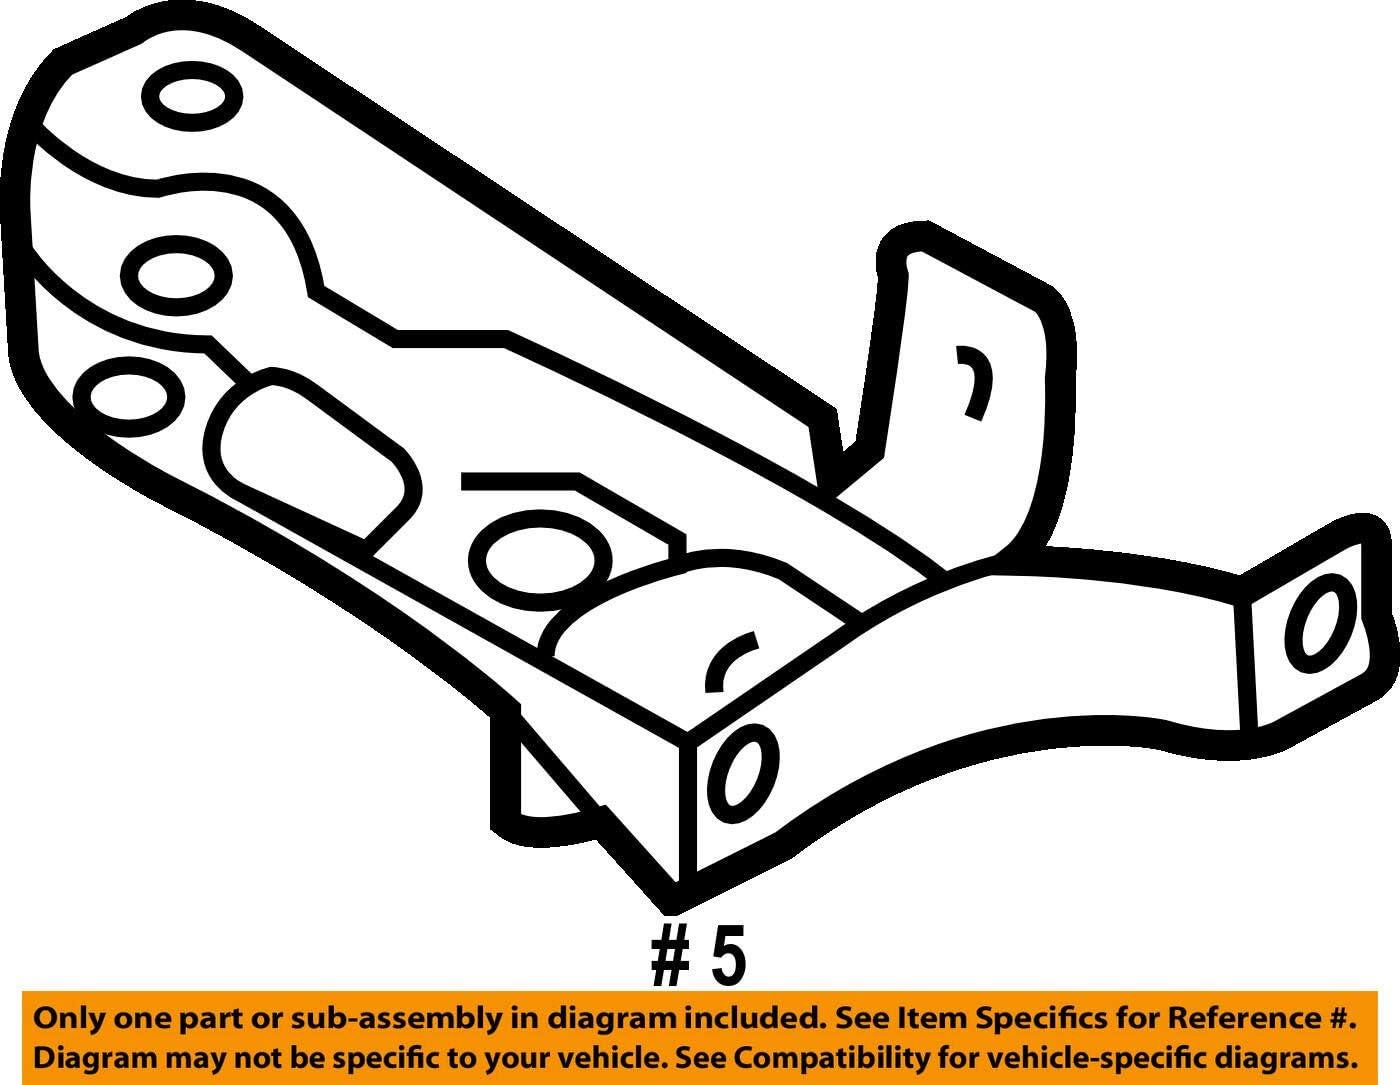 Genuine Brace right AUDI A3 S3 Sportback Lim quattro 8P1 8PA 8P0821136A